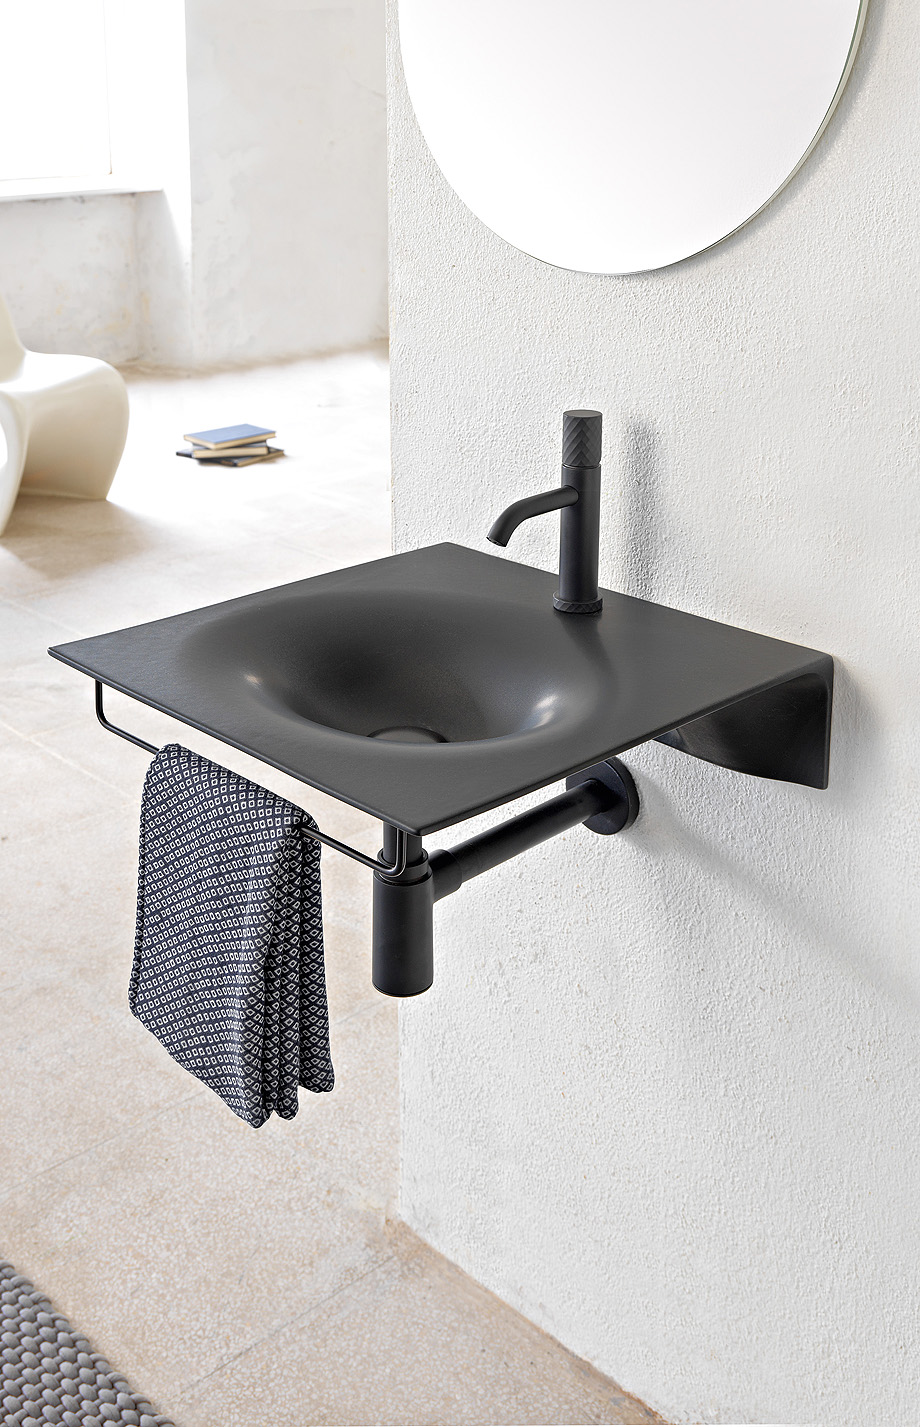 lavabo veil de massimiliano braconi y scarabeo (2)